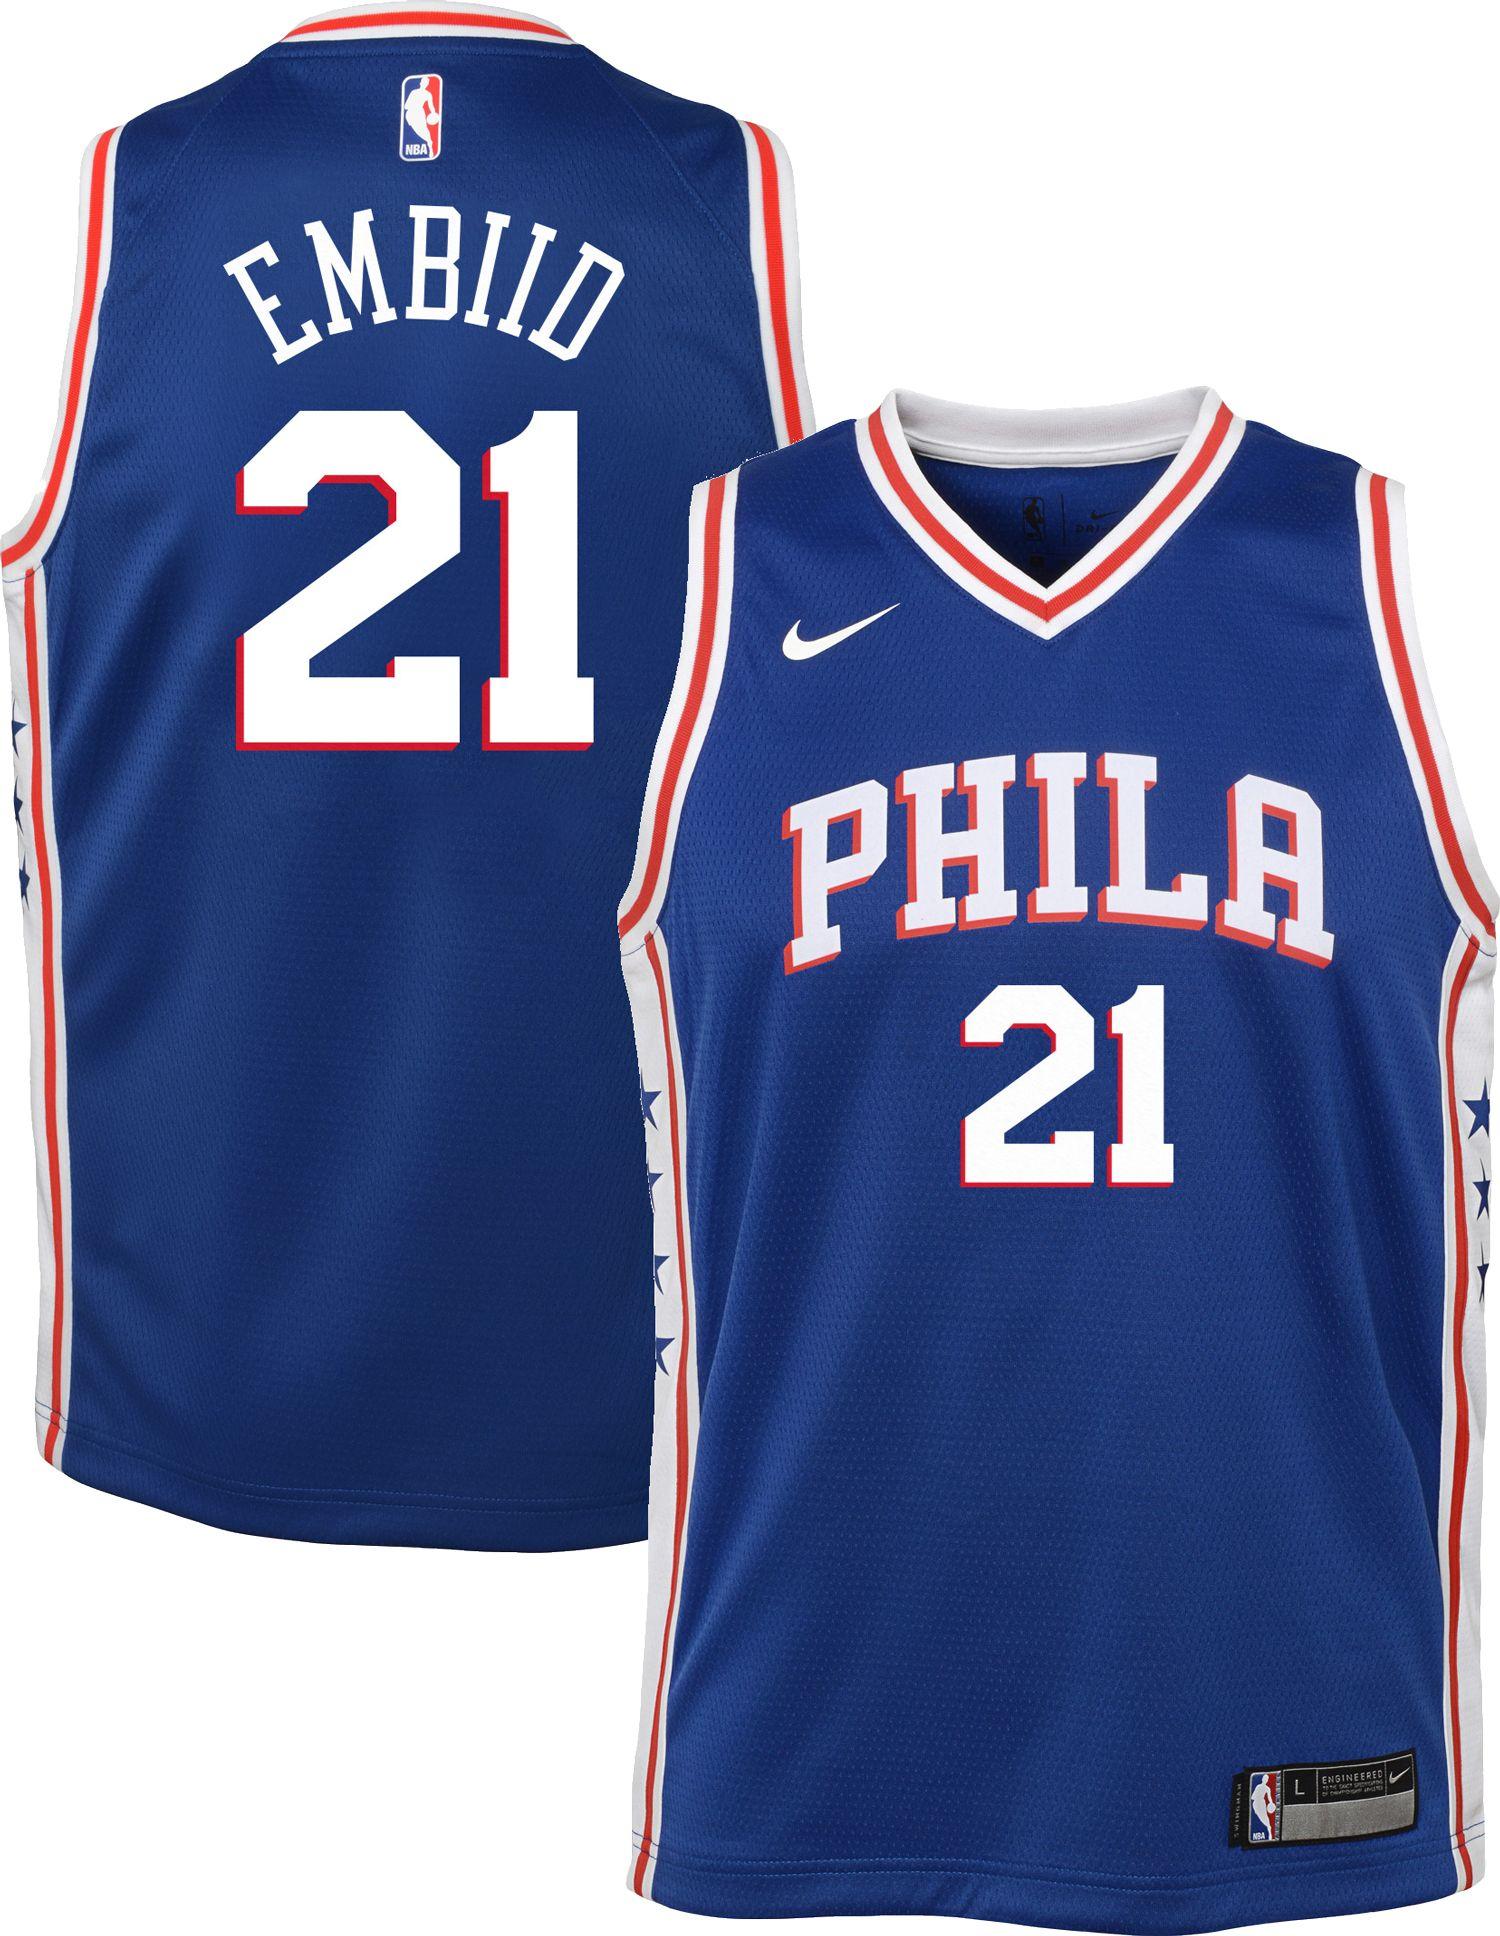 6ca1a9143 ... amazon nike youth philadelphia 76ers joel embiid 21 royal dri fit swingman  jersey b35bf 5452b